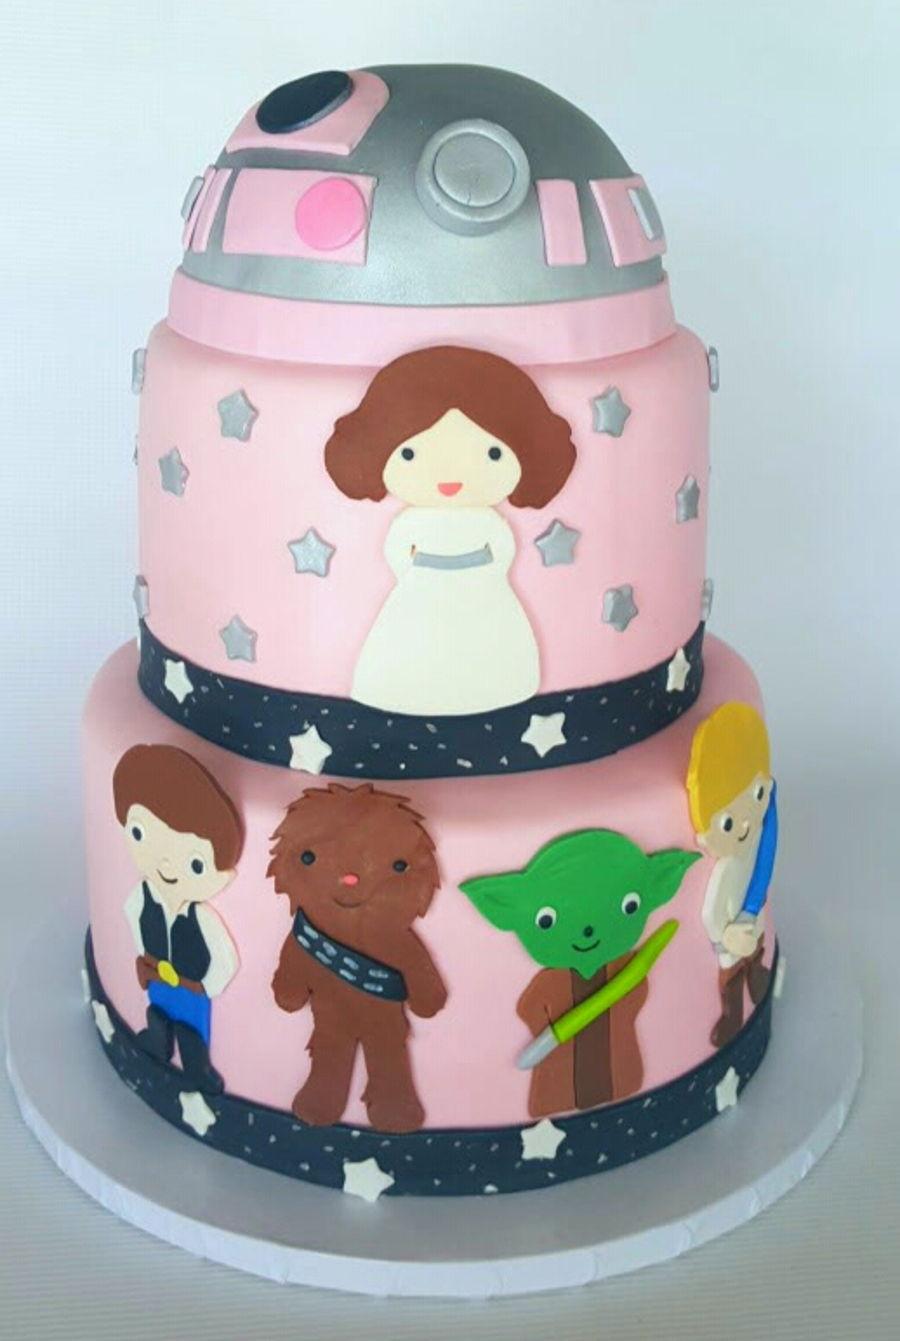 Star Wars Birthday Cakes Photo Gallery